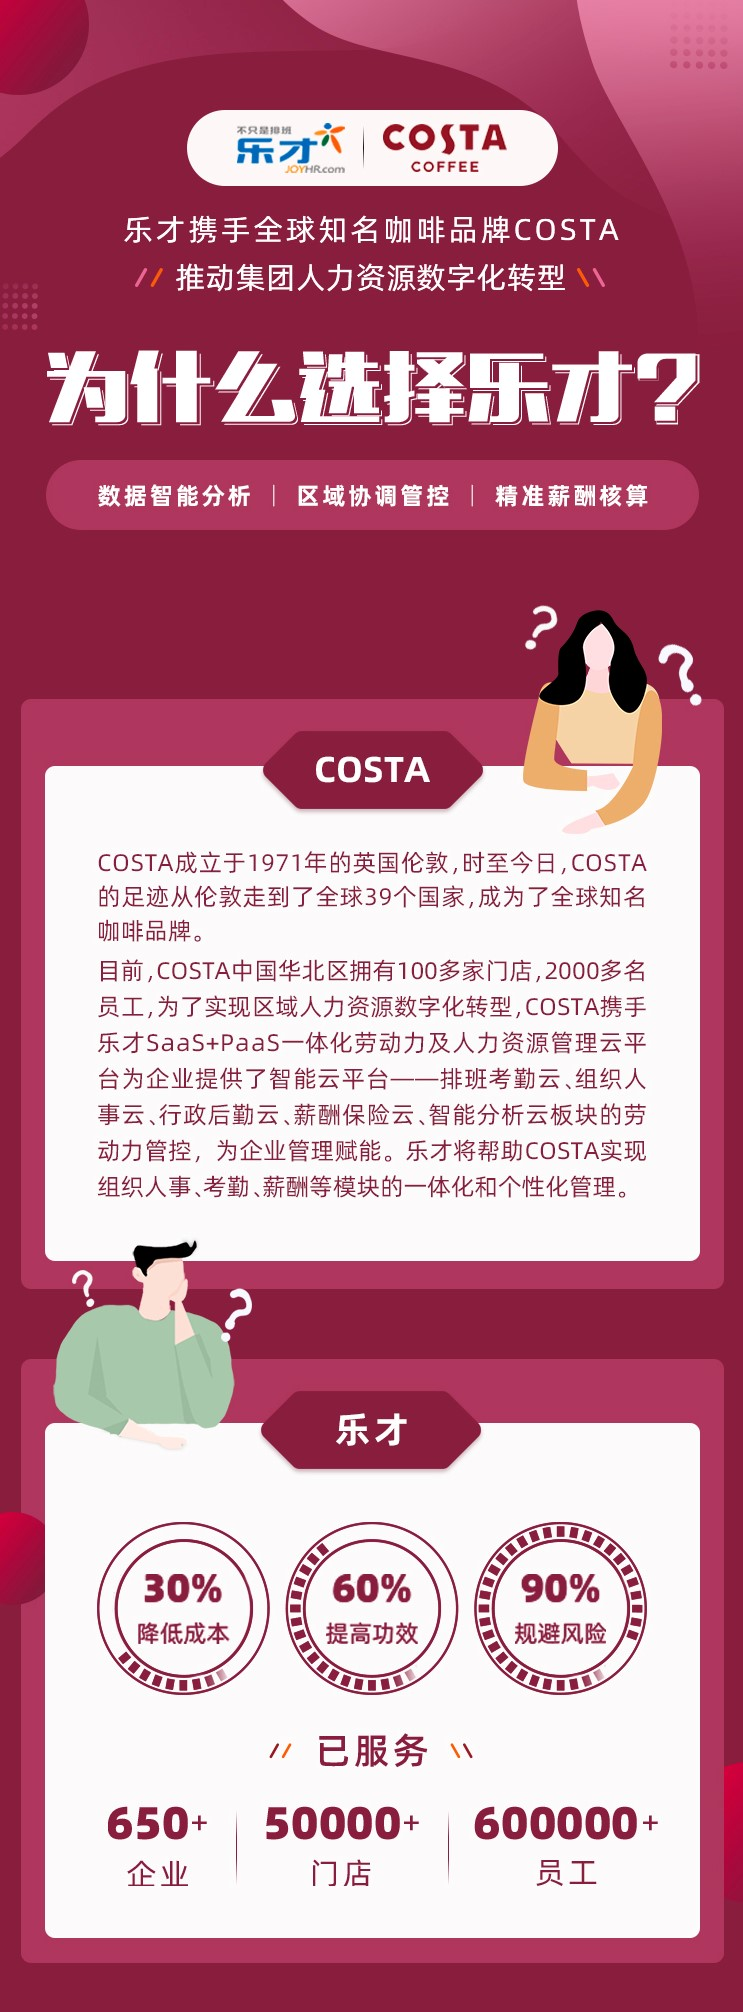 COSTA2.jpg